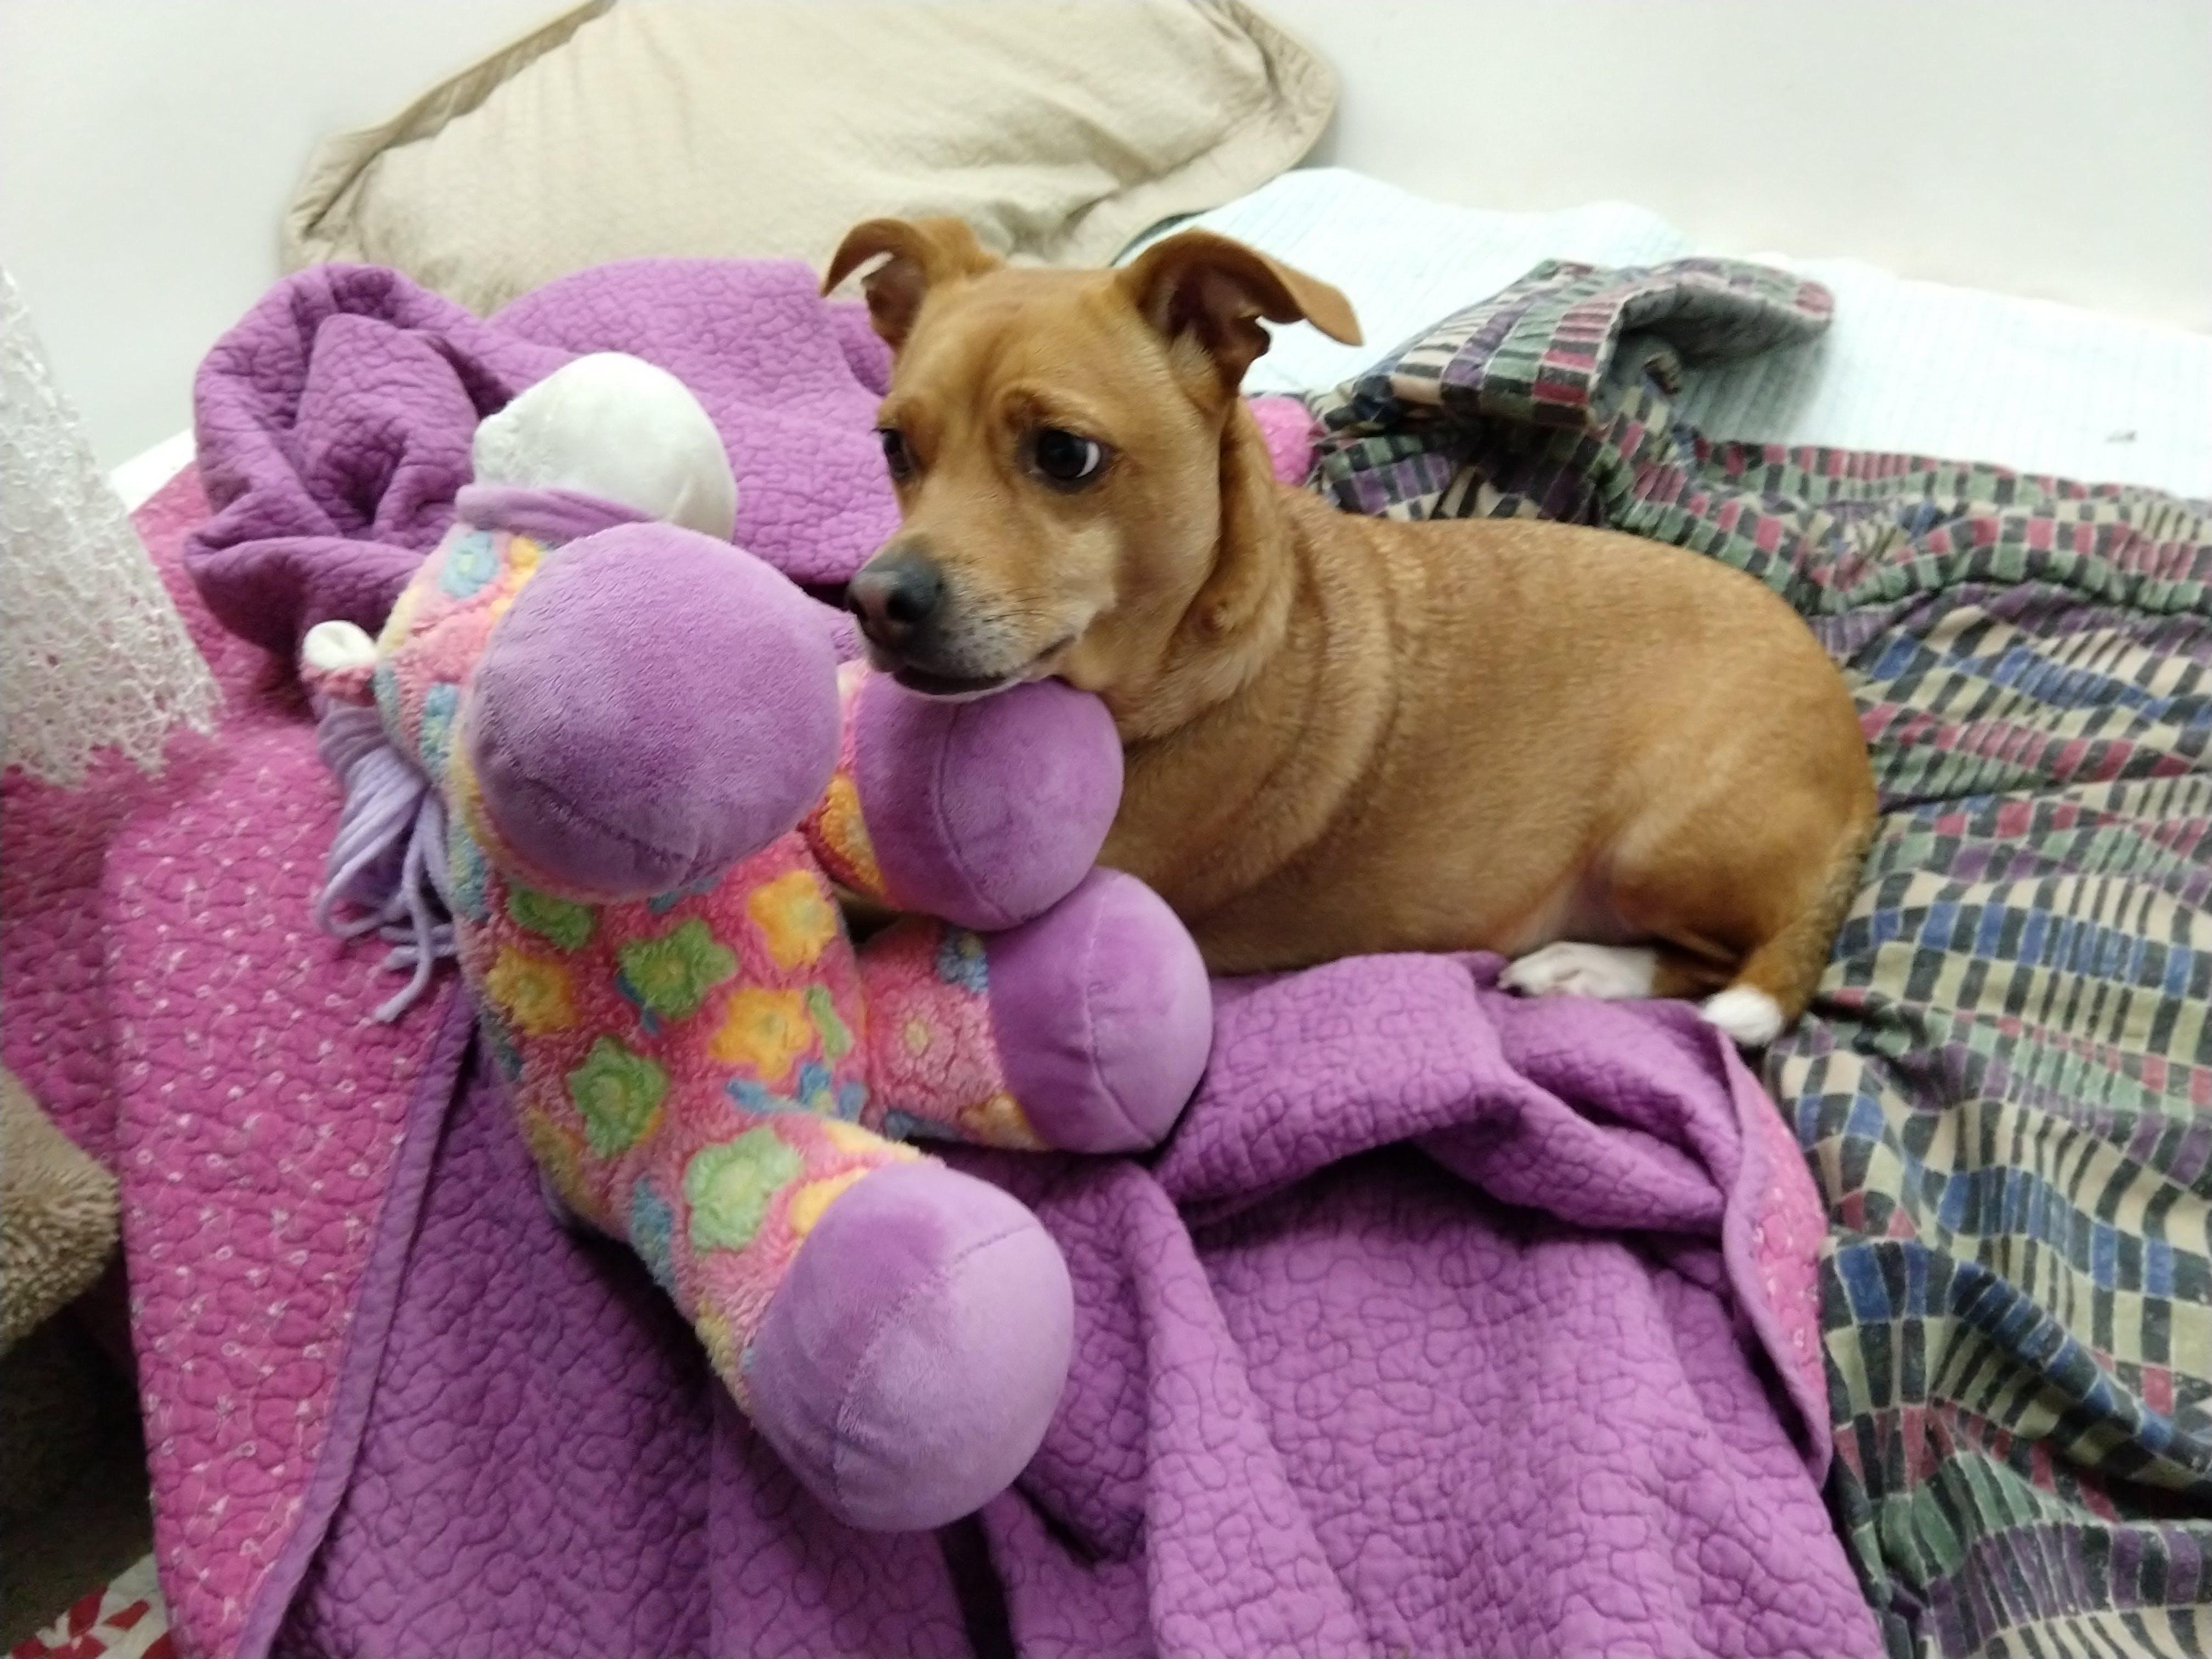 Free stock photo of Cojack, dog, purple toy